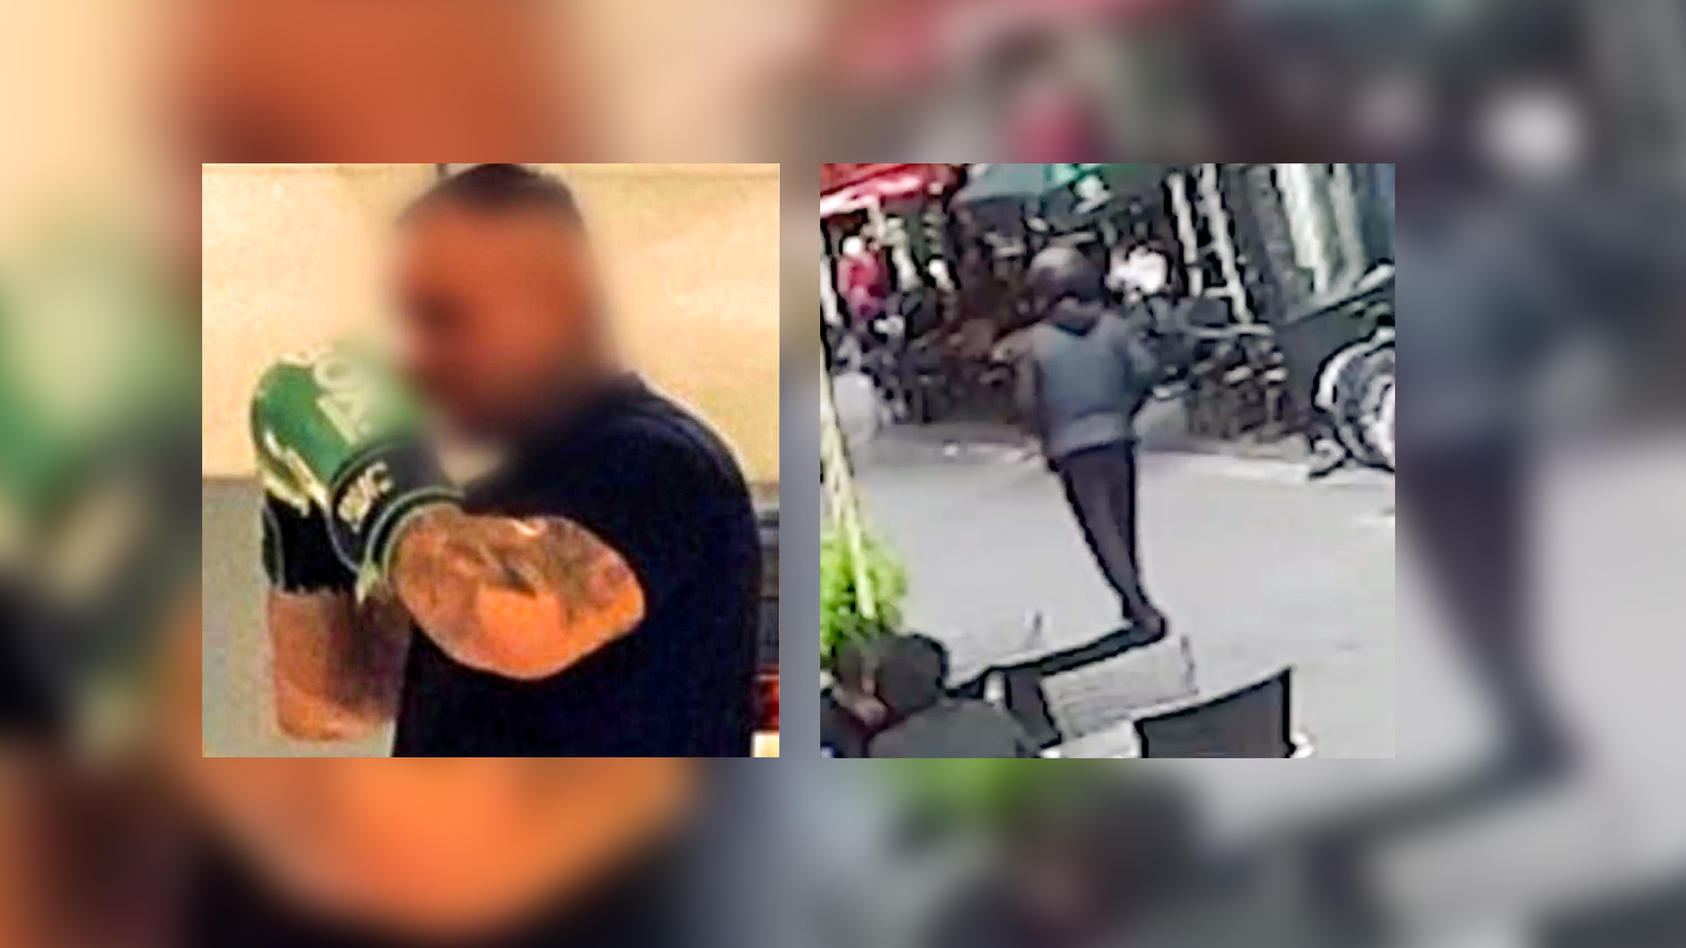 Die Tatverdächtigen des Mordanschlags auf Reporter de Vries